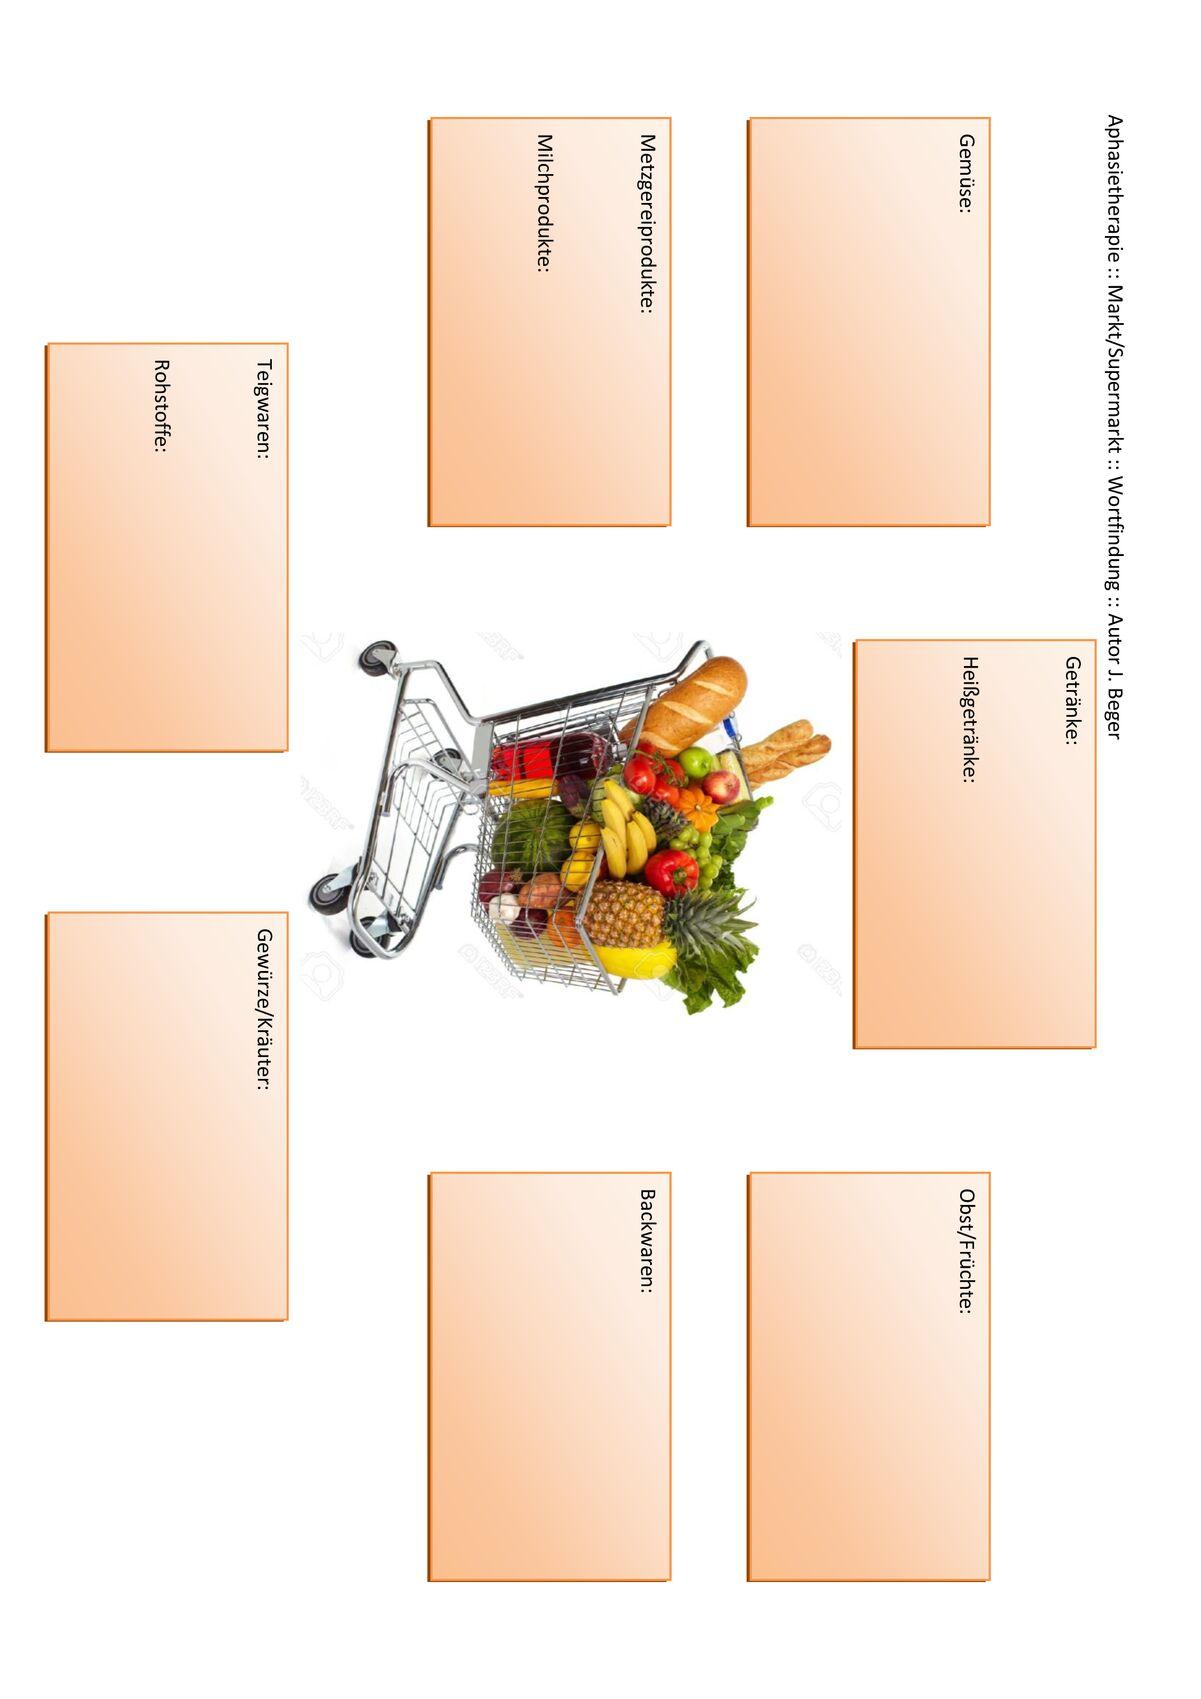 Arbeitsblatt Erkundung Supermarkt 4teachers Lehrproben